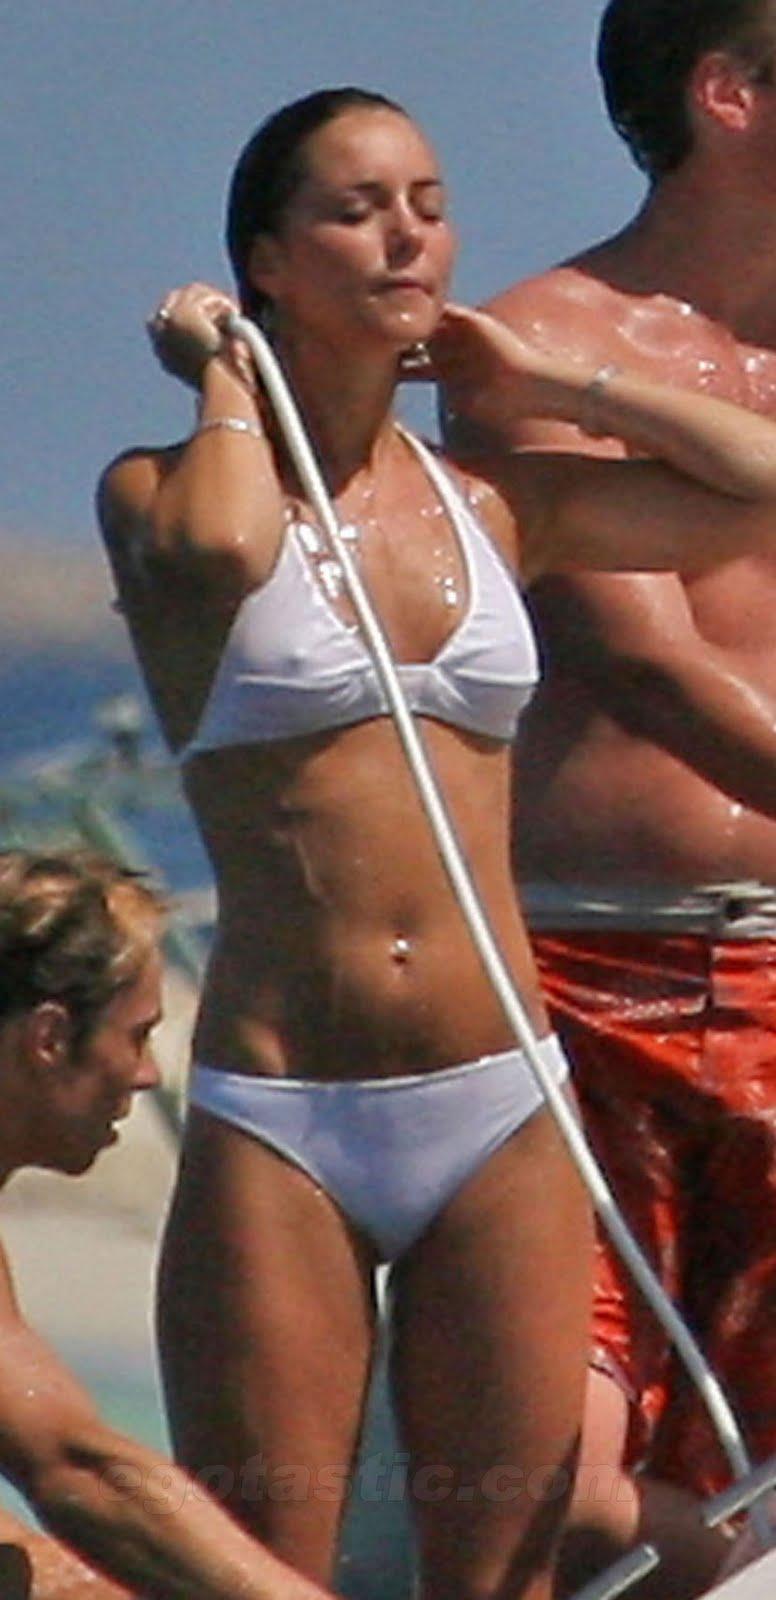 Sideboobs Cleavage Shelley Conn  nudes (37 pictures), Instagram, panties